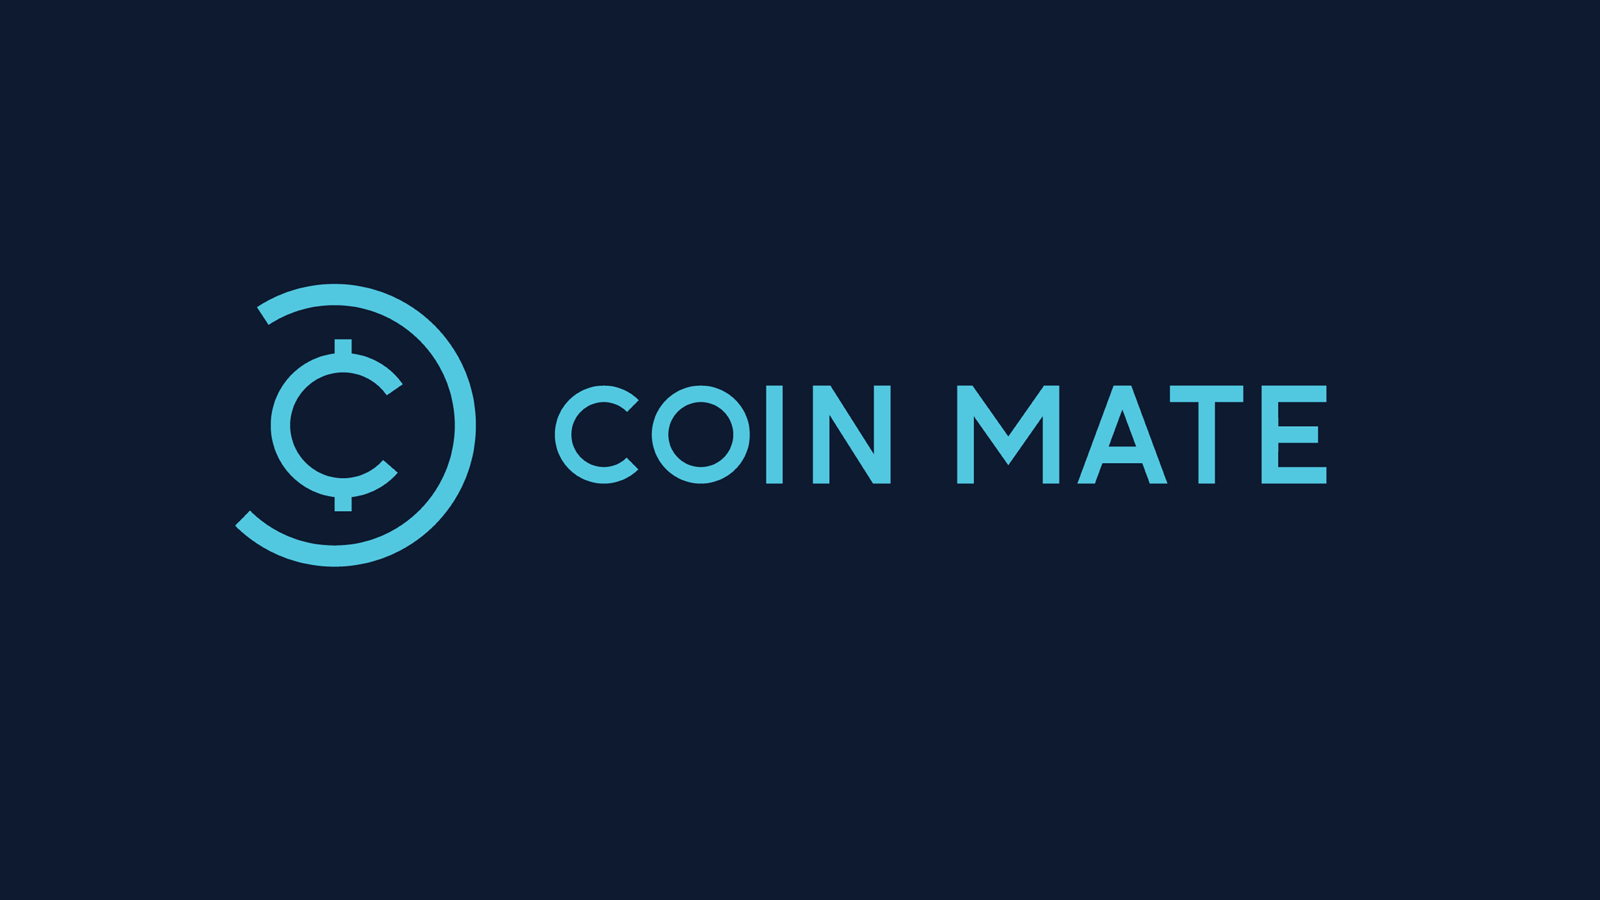 CoinMate Promo Codes 2020